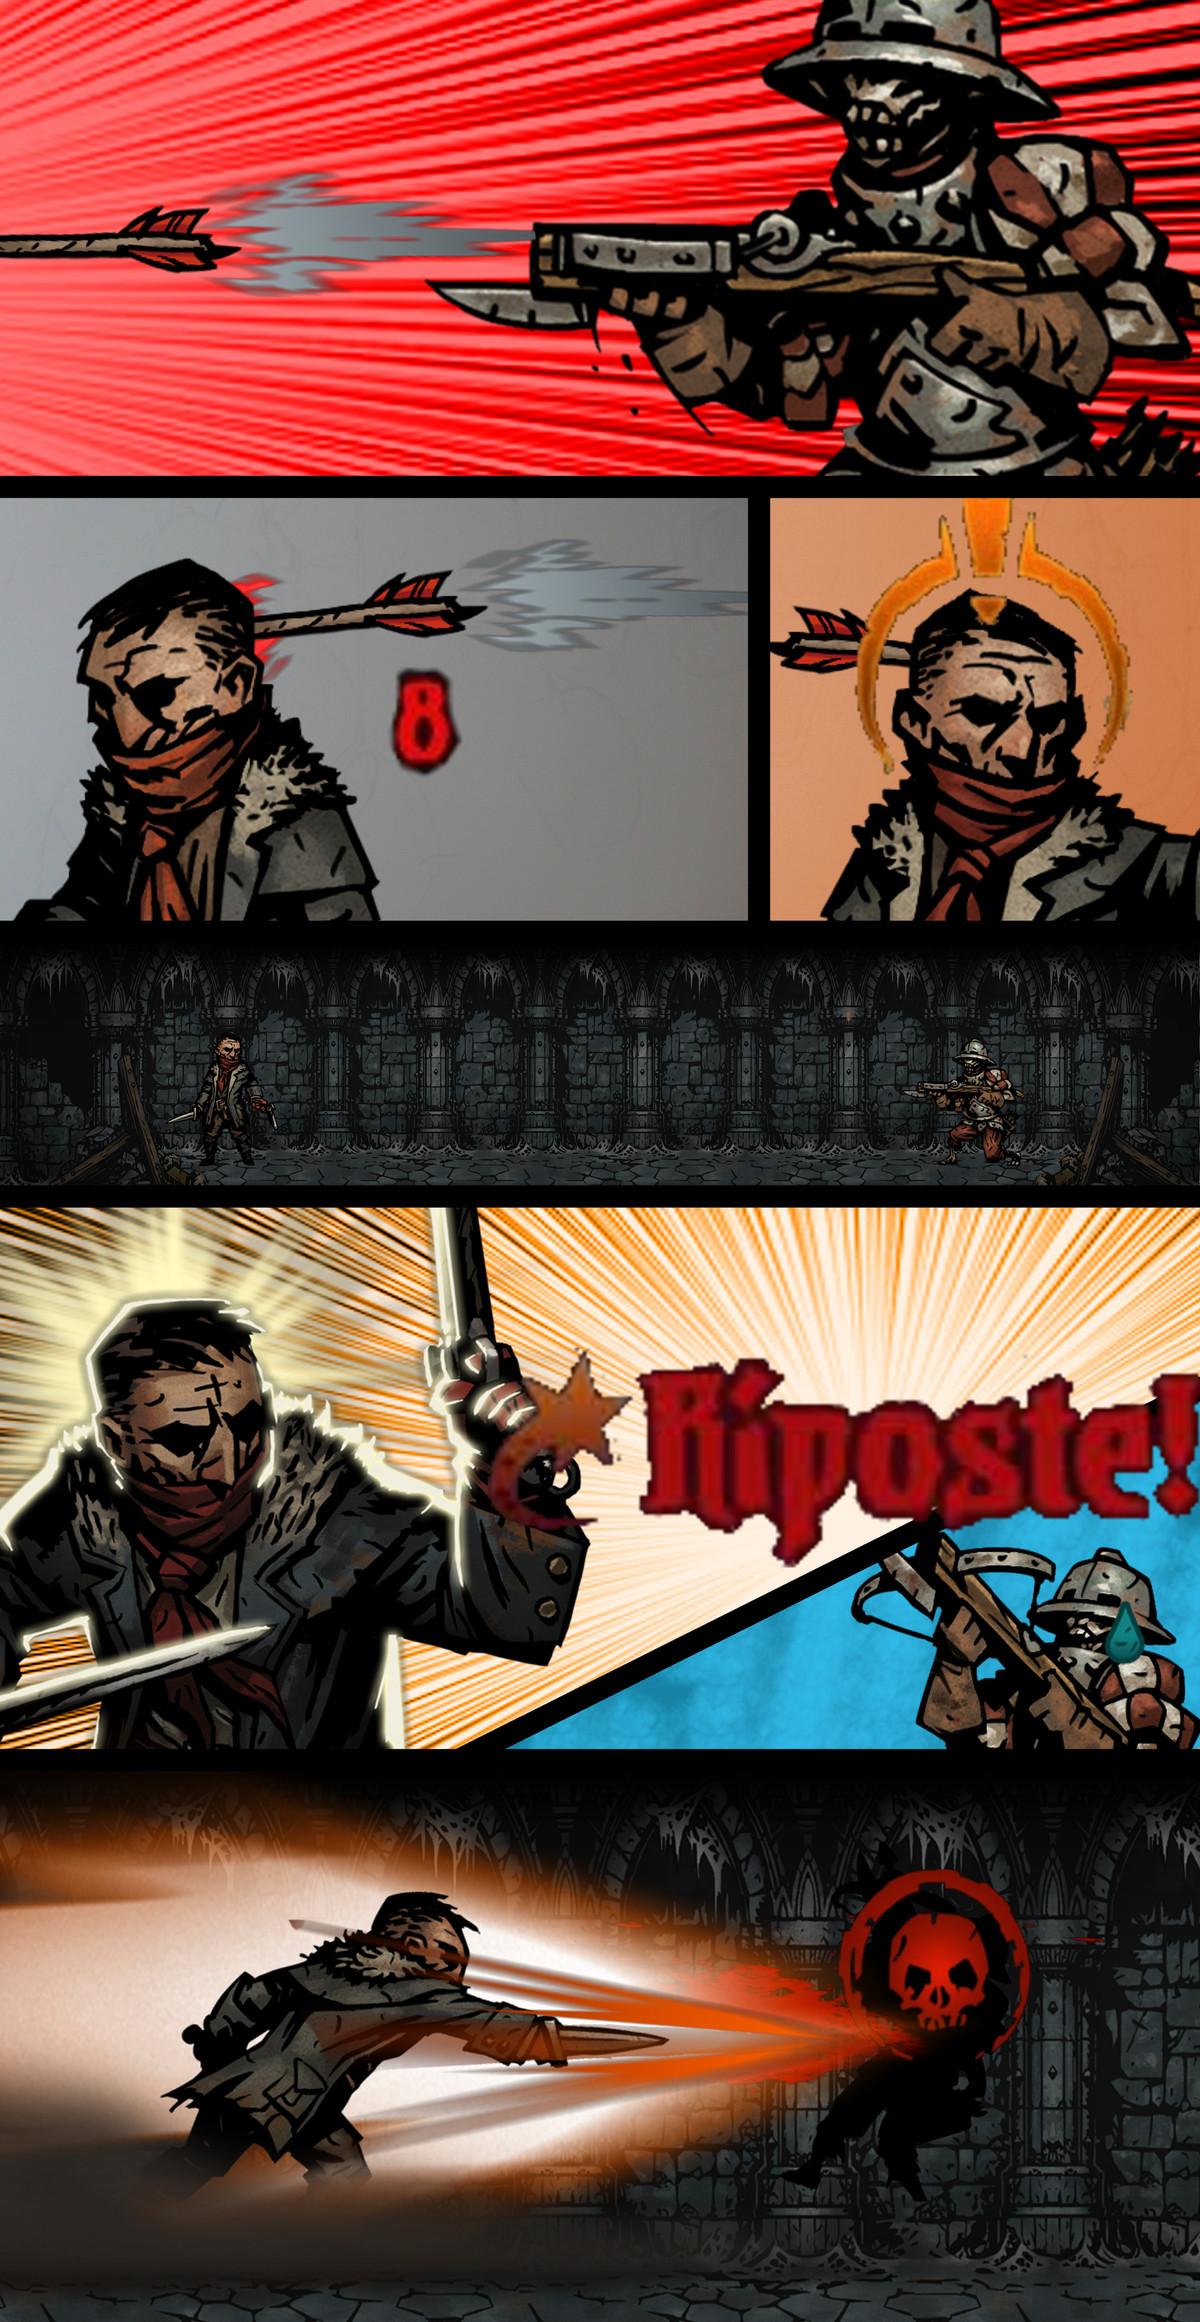 How long-range riposte works. Comic made by papaporo_paprito: www.reddit.com/r/darkestdungeon/comme..... Dio Brando had a third son! Dismas. darkest Dungeon Dismas Highwayman bone Arbalest Riposte arrow to the head comic videogame